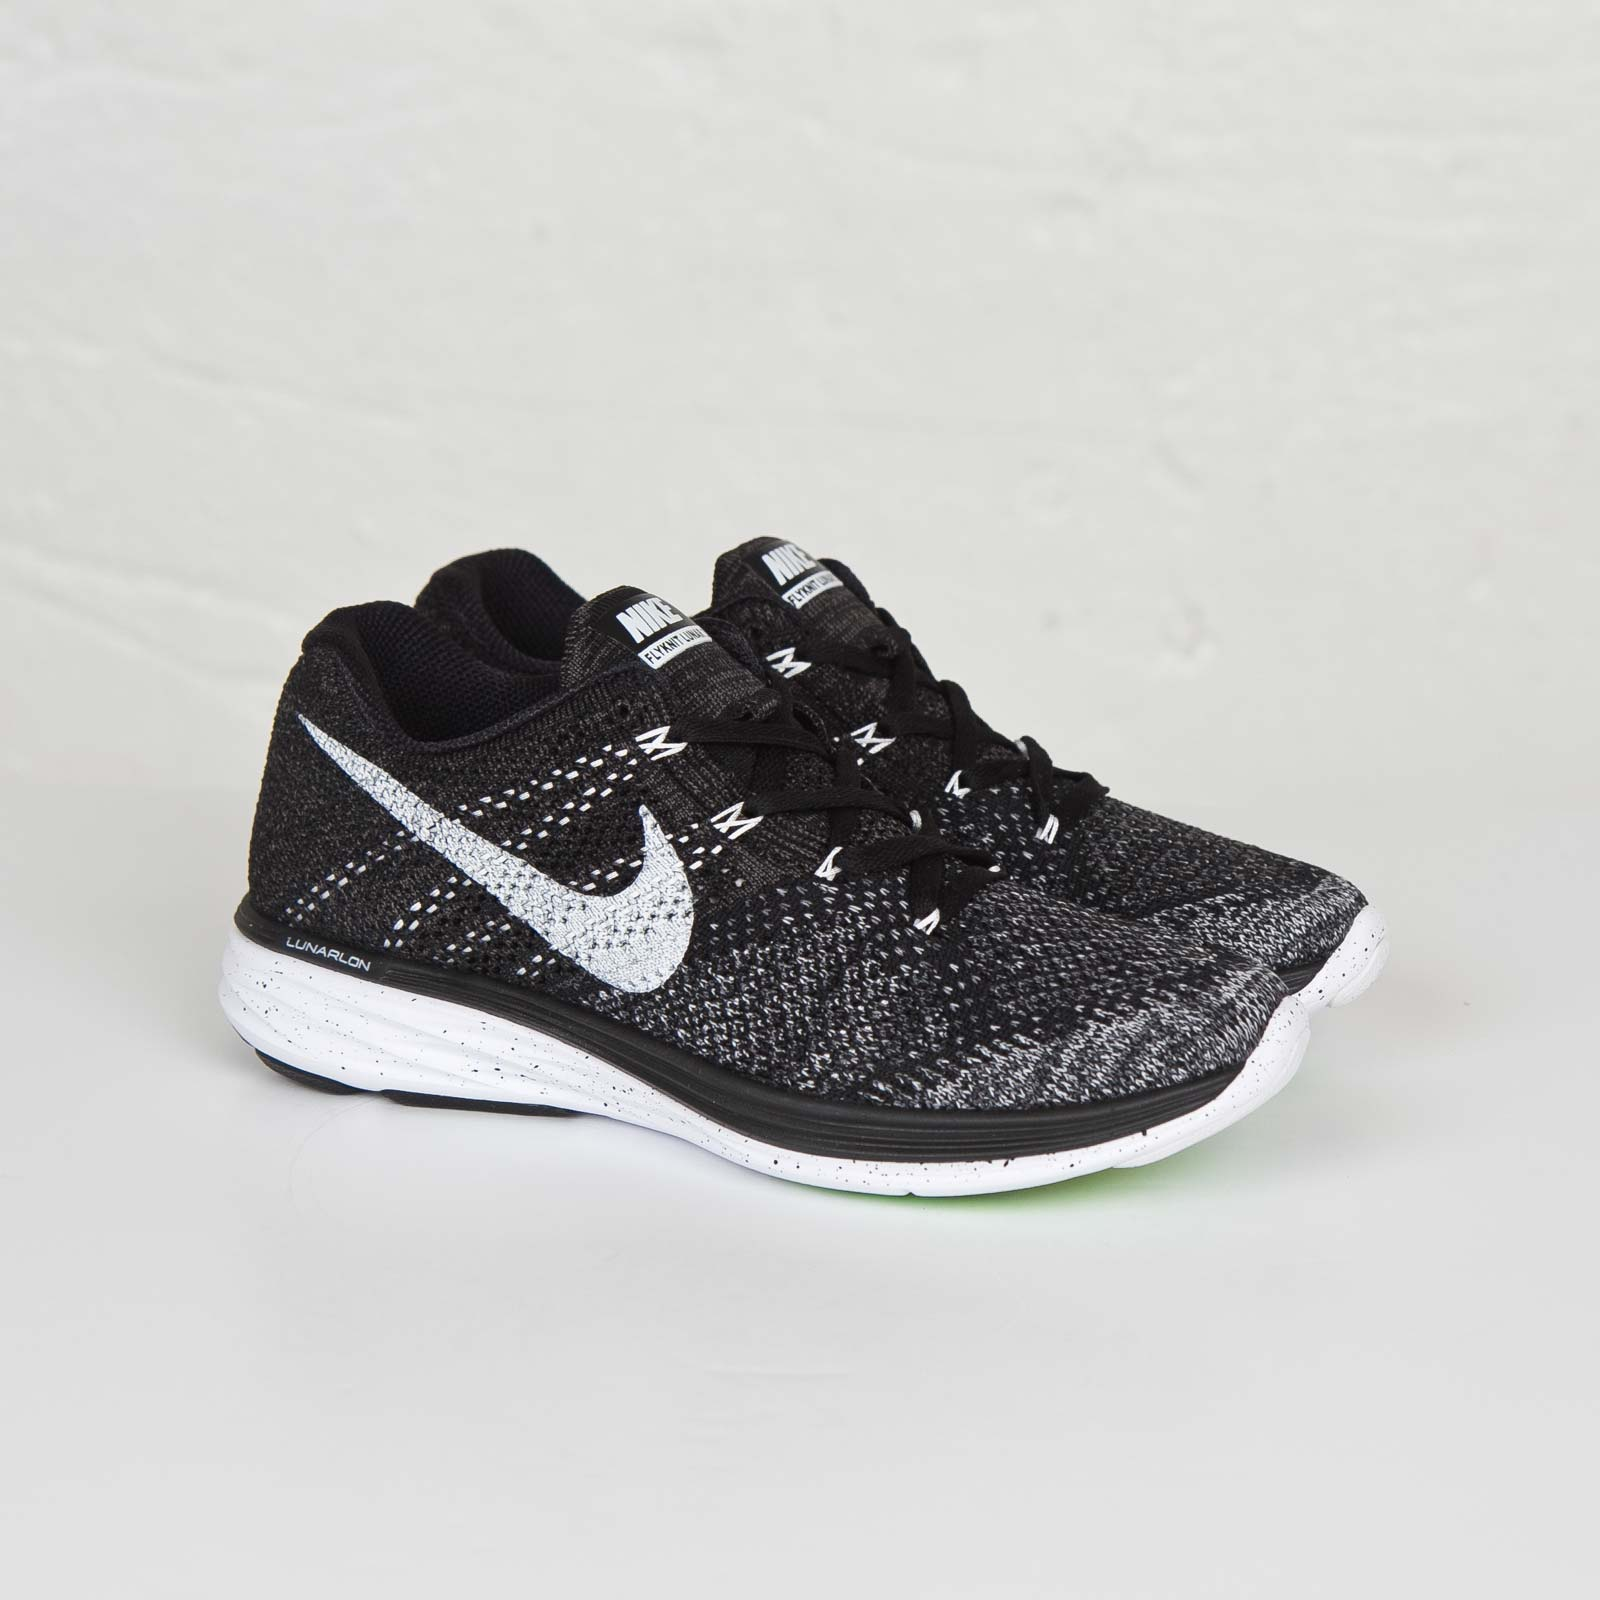 innovative design cfa67 8b8ef Nike Wmns Flyknit Lunar3 - 698182-001 - Sneakersnstuff ...